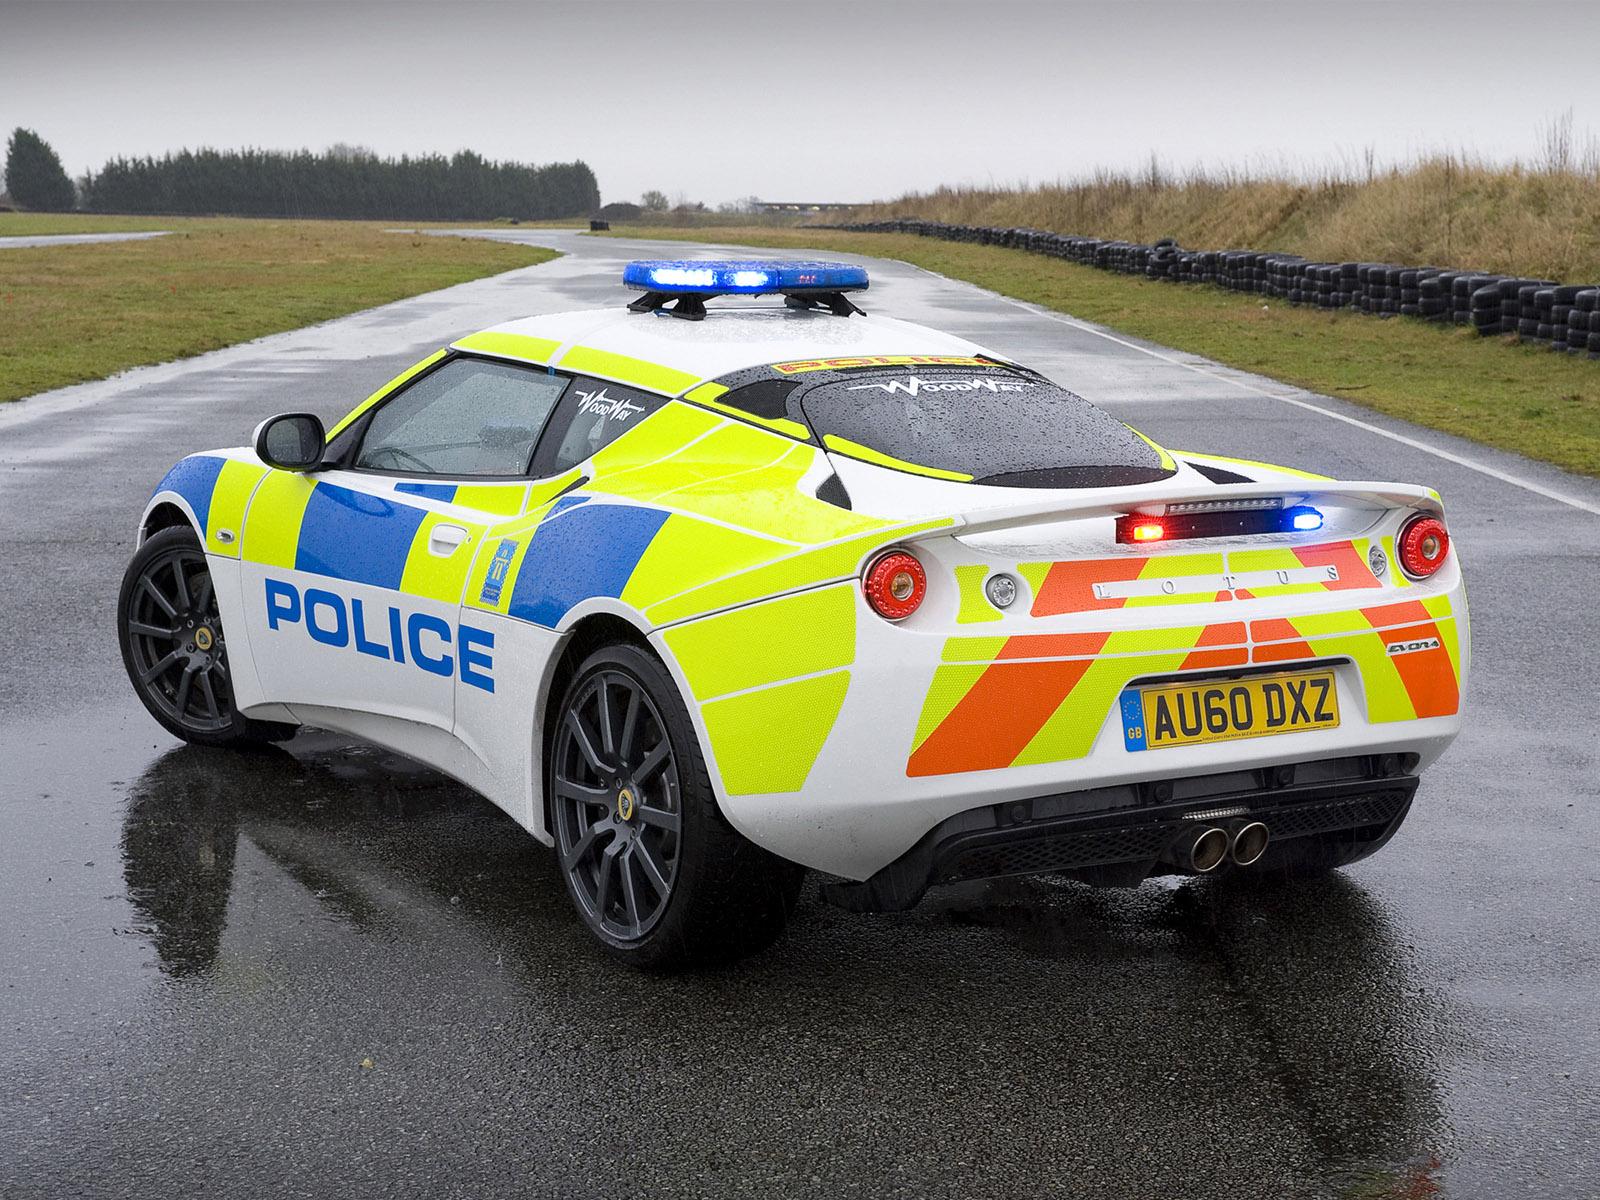 2010 Lotus Evora Police Supercar Supercars F Wallpaper